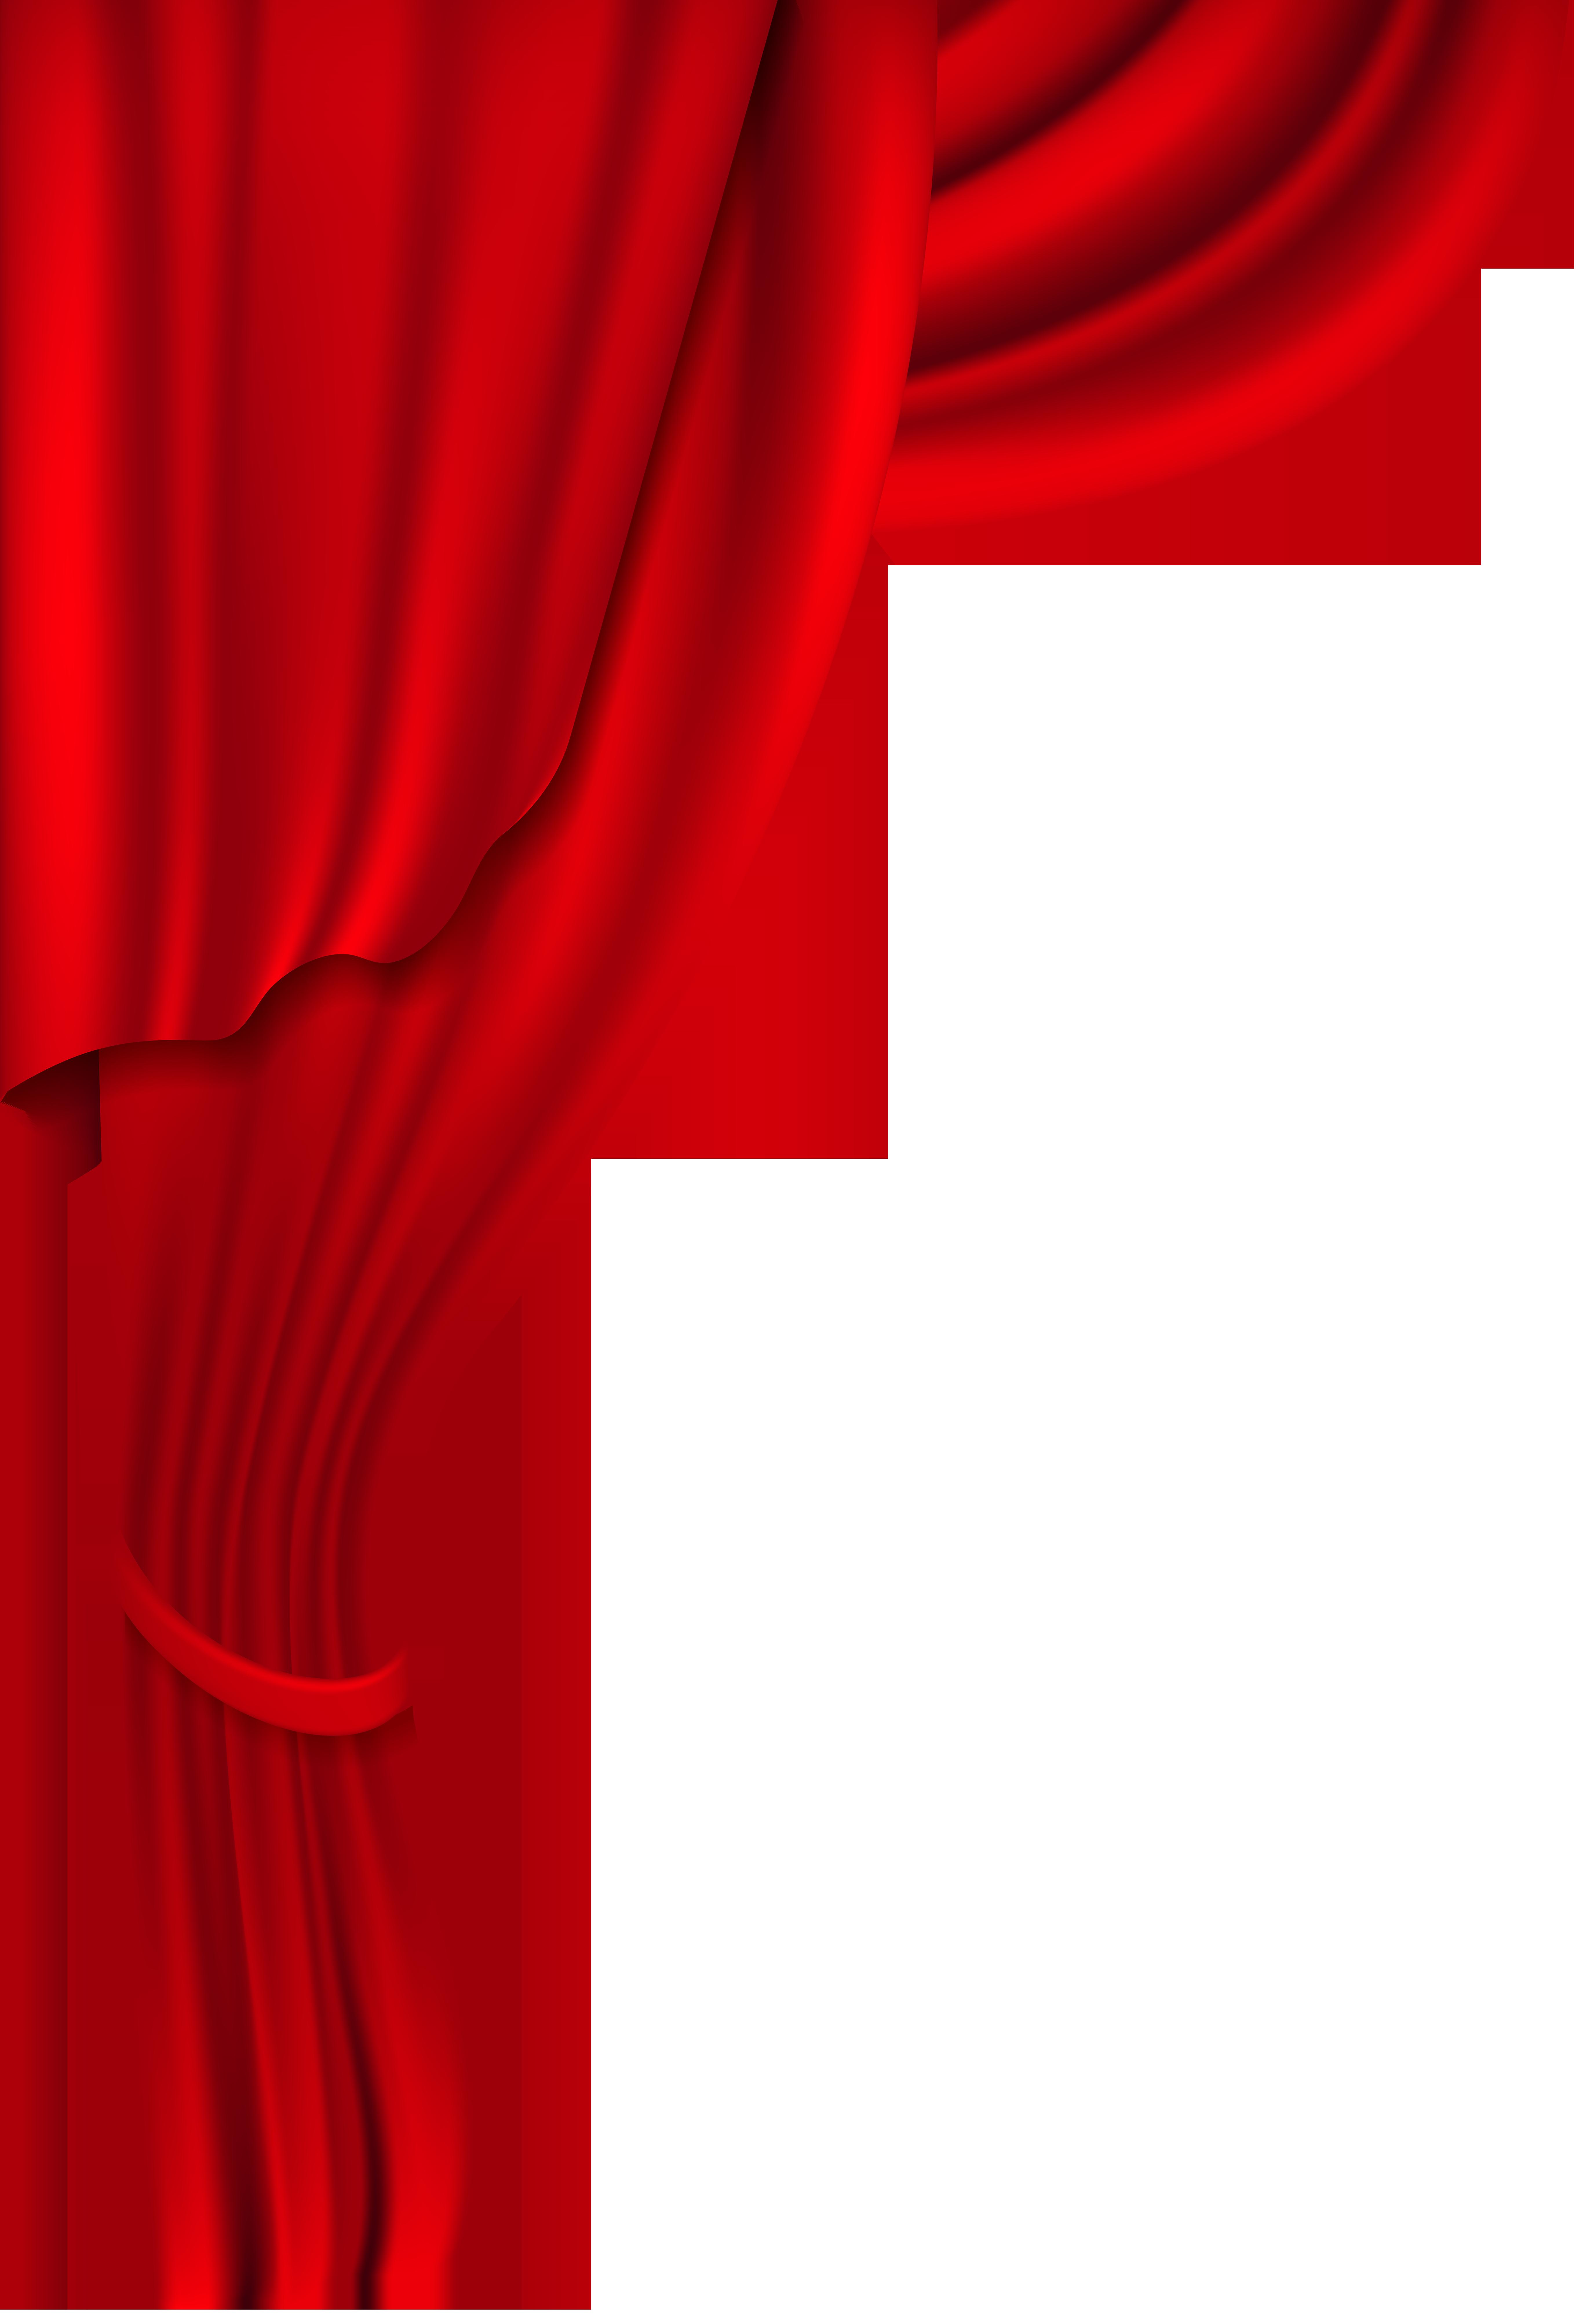 Red Curtain Transparent Clip Art Image.